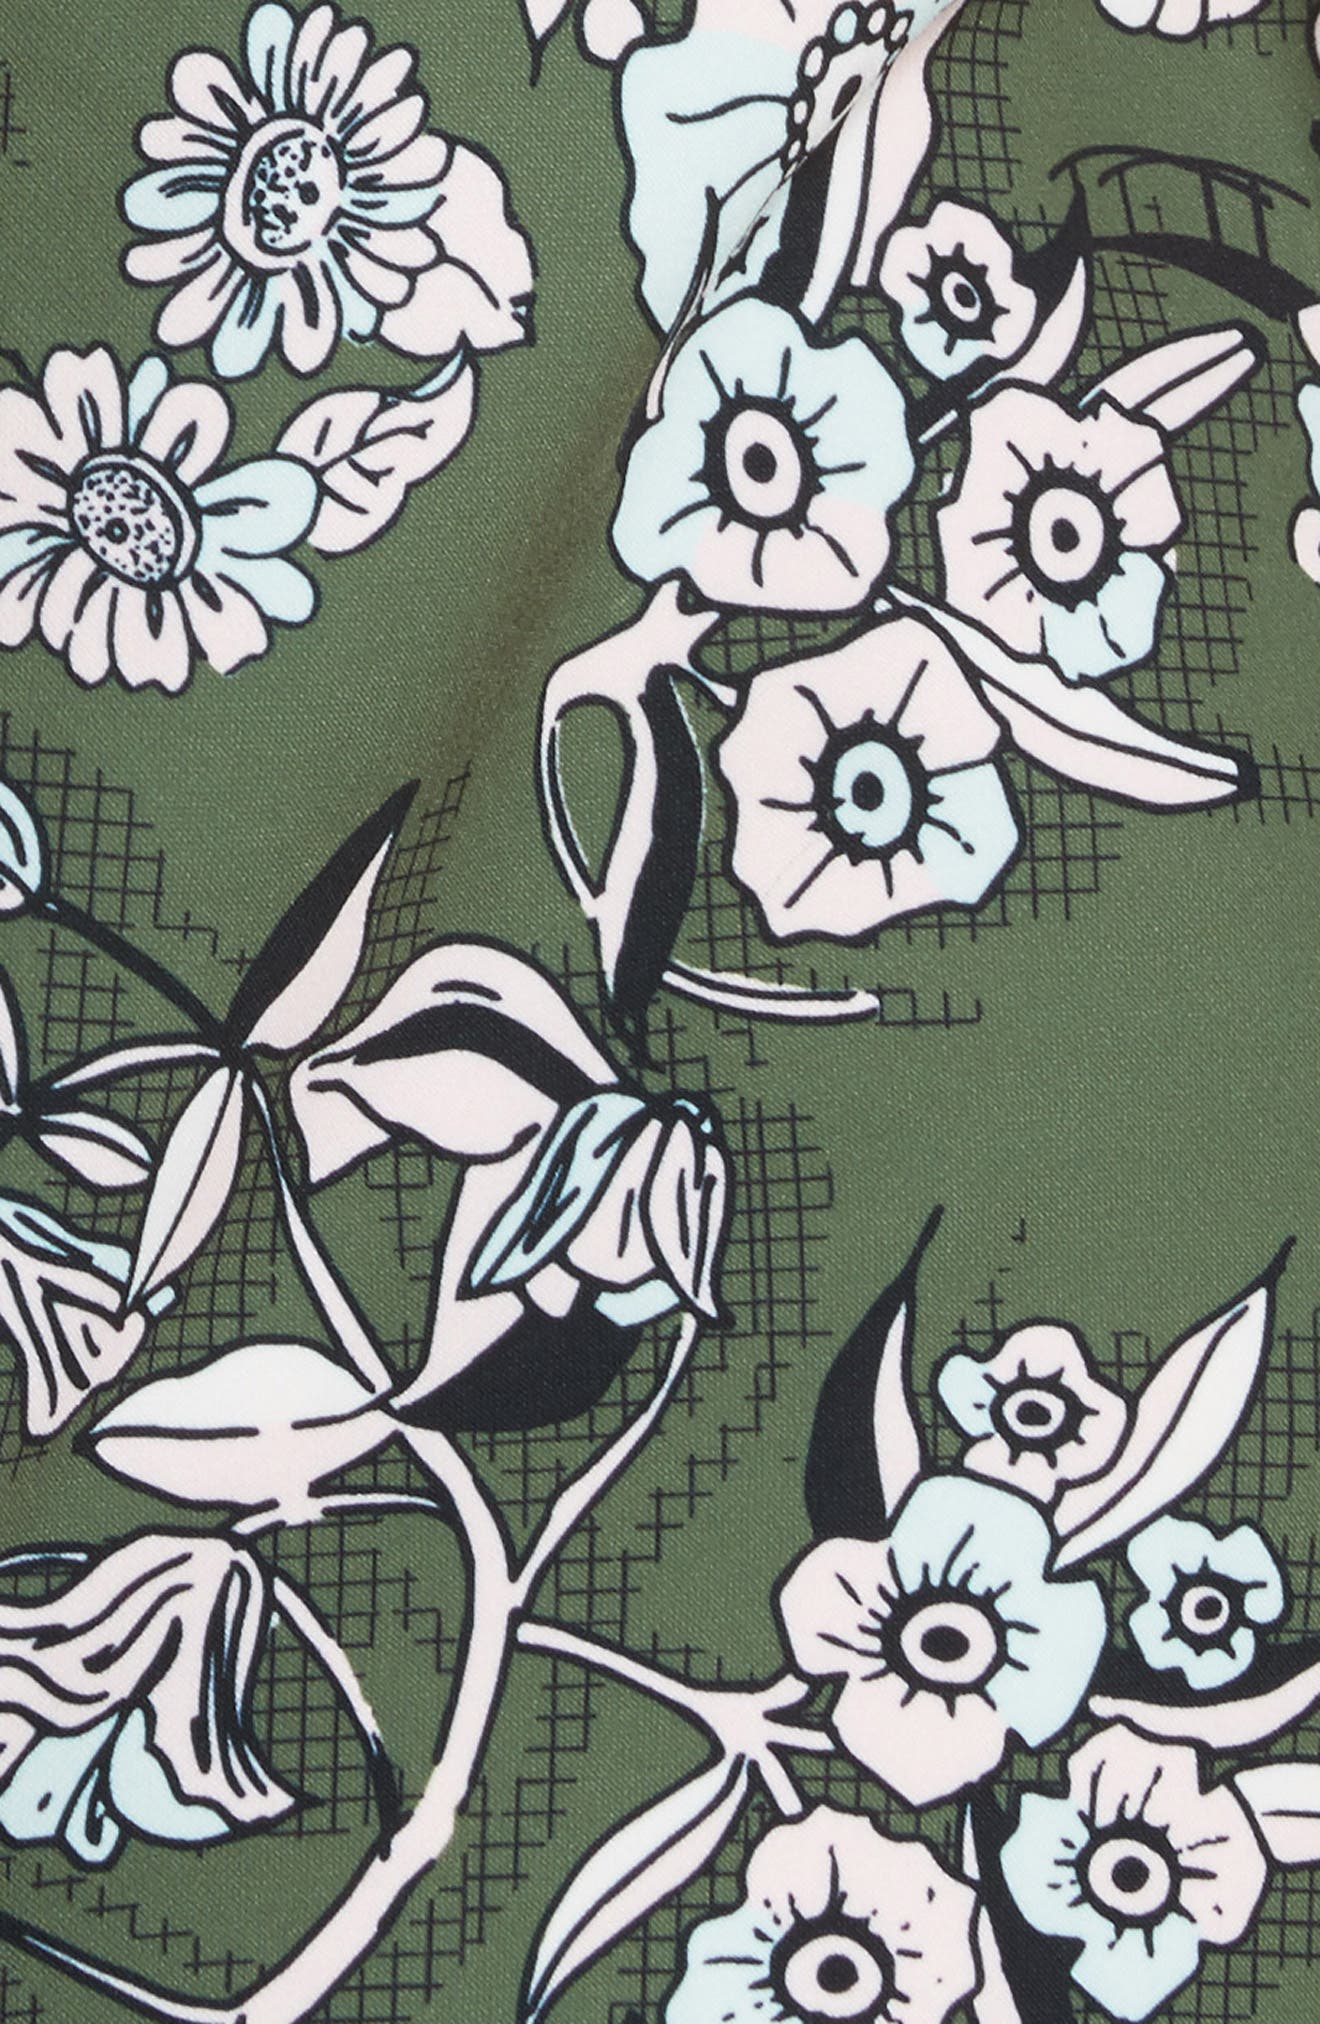 Hoster Floral Print Ruffle Hem Dress,                             Alternate thumbnail 5, color,                             311